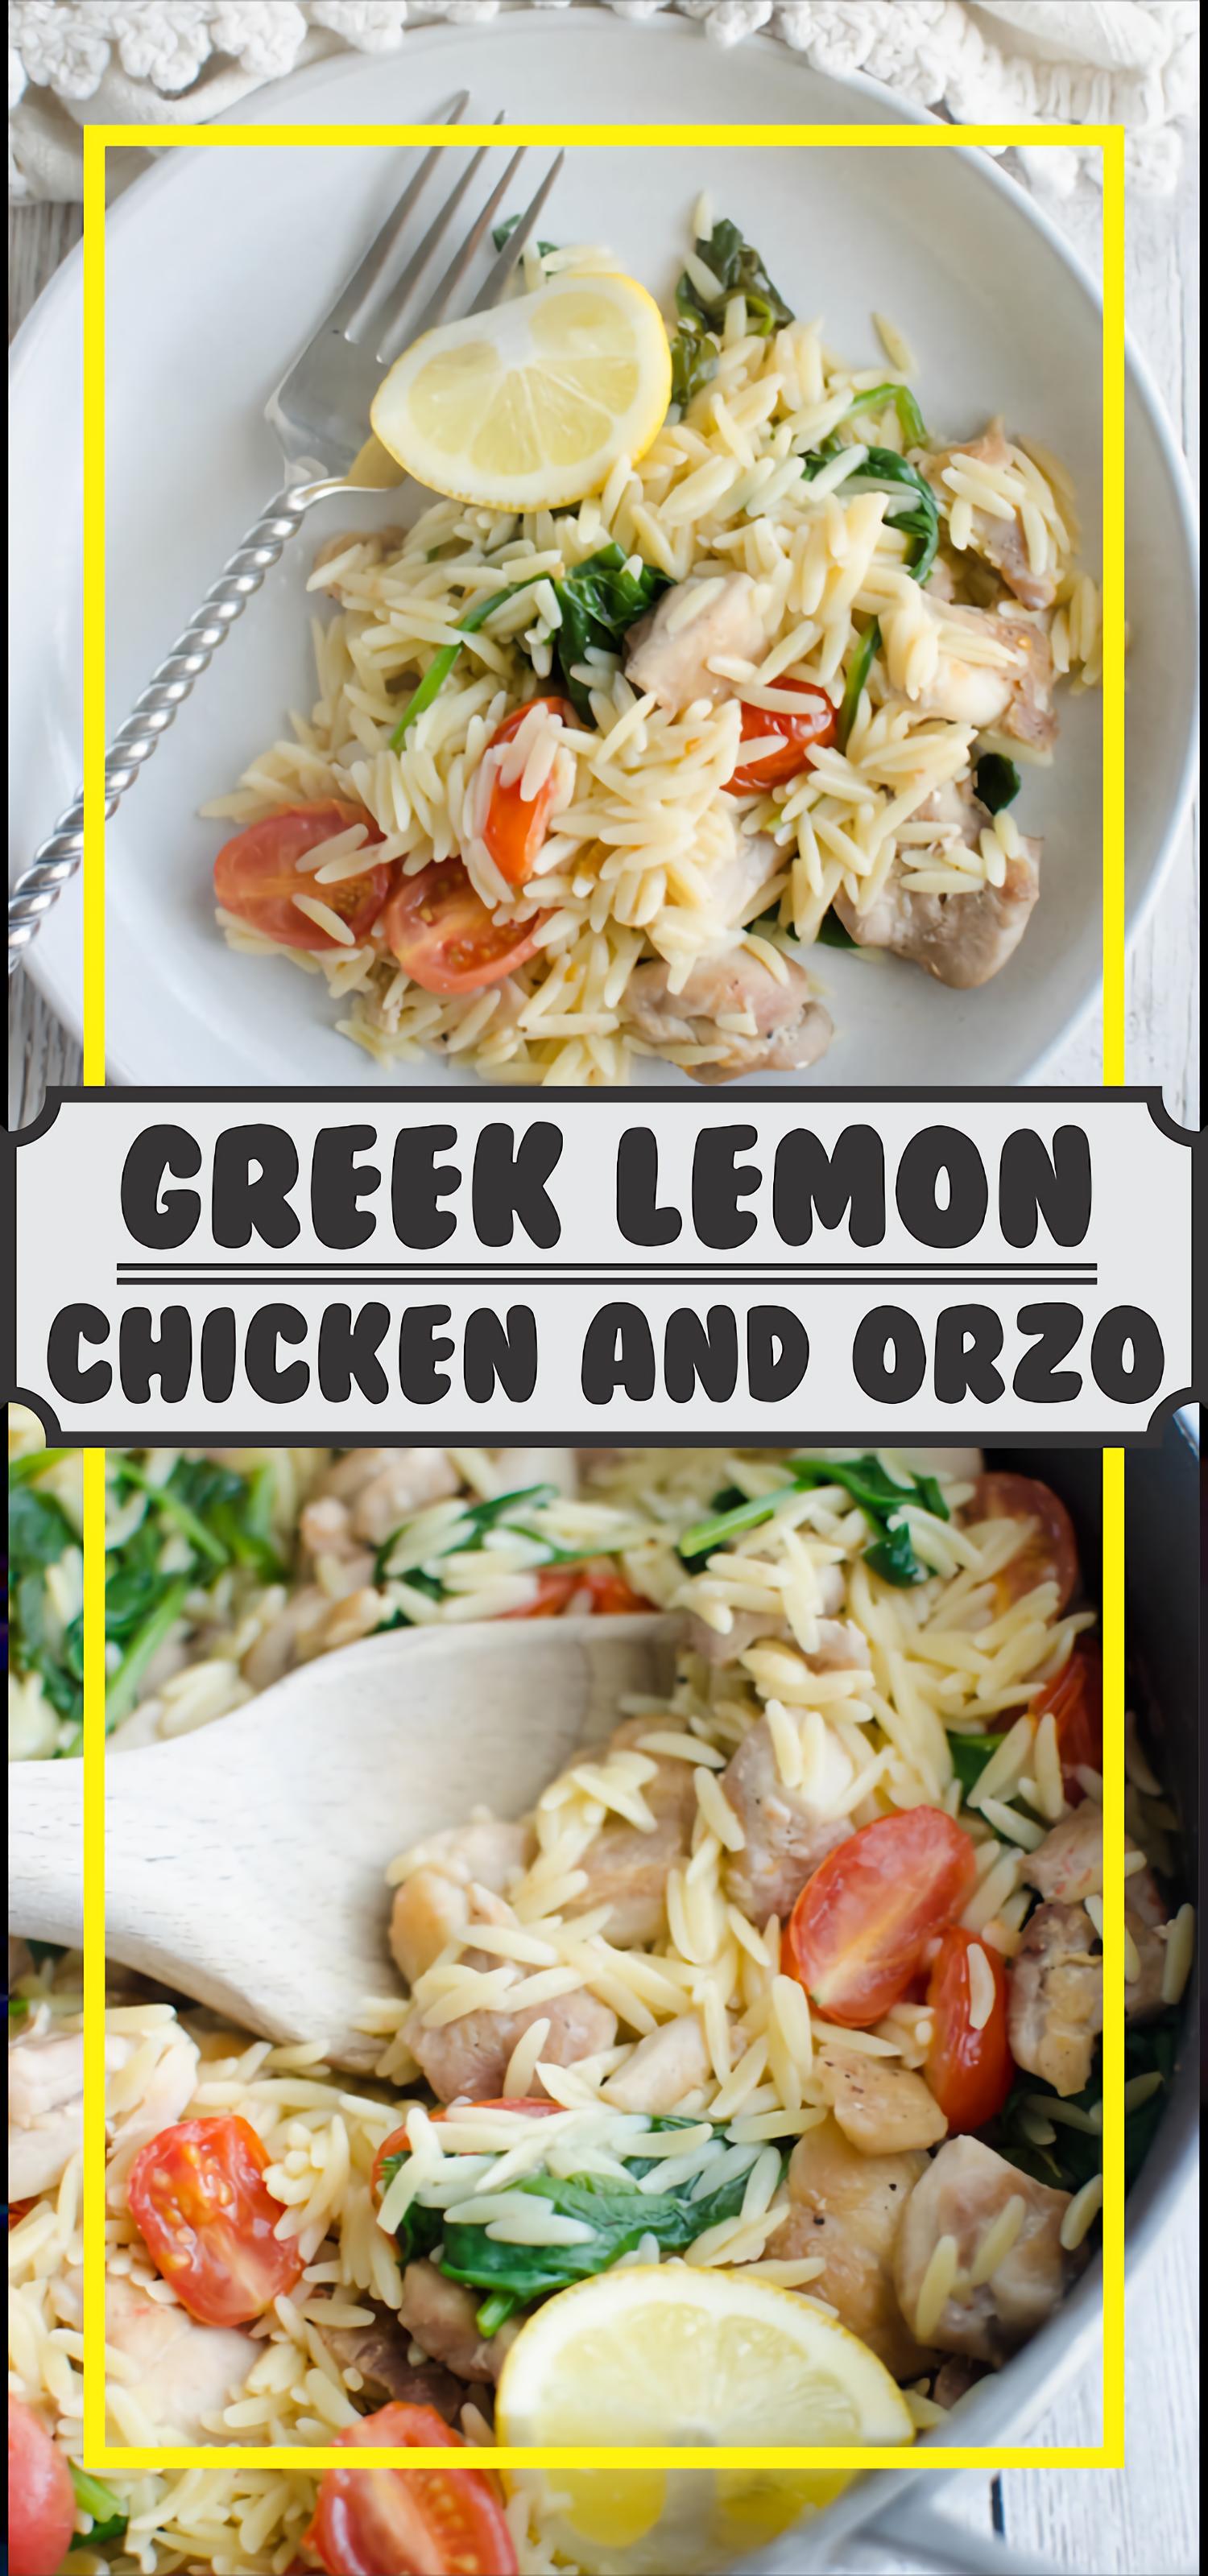 Greek Lemon Chicken and Orzo #Chicken #Foodrecipes #greeklemonrice